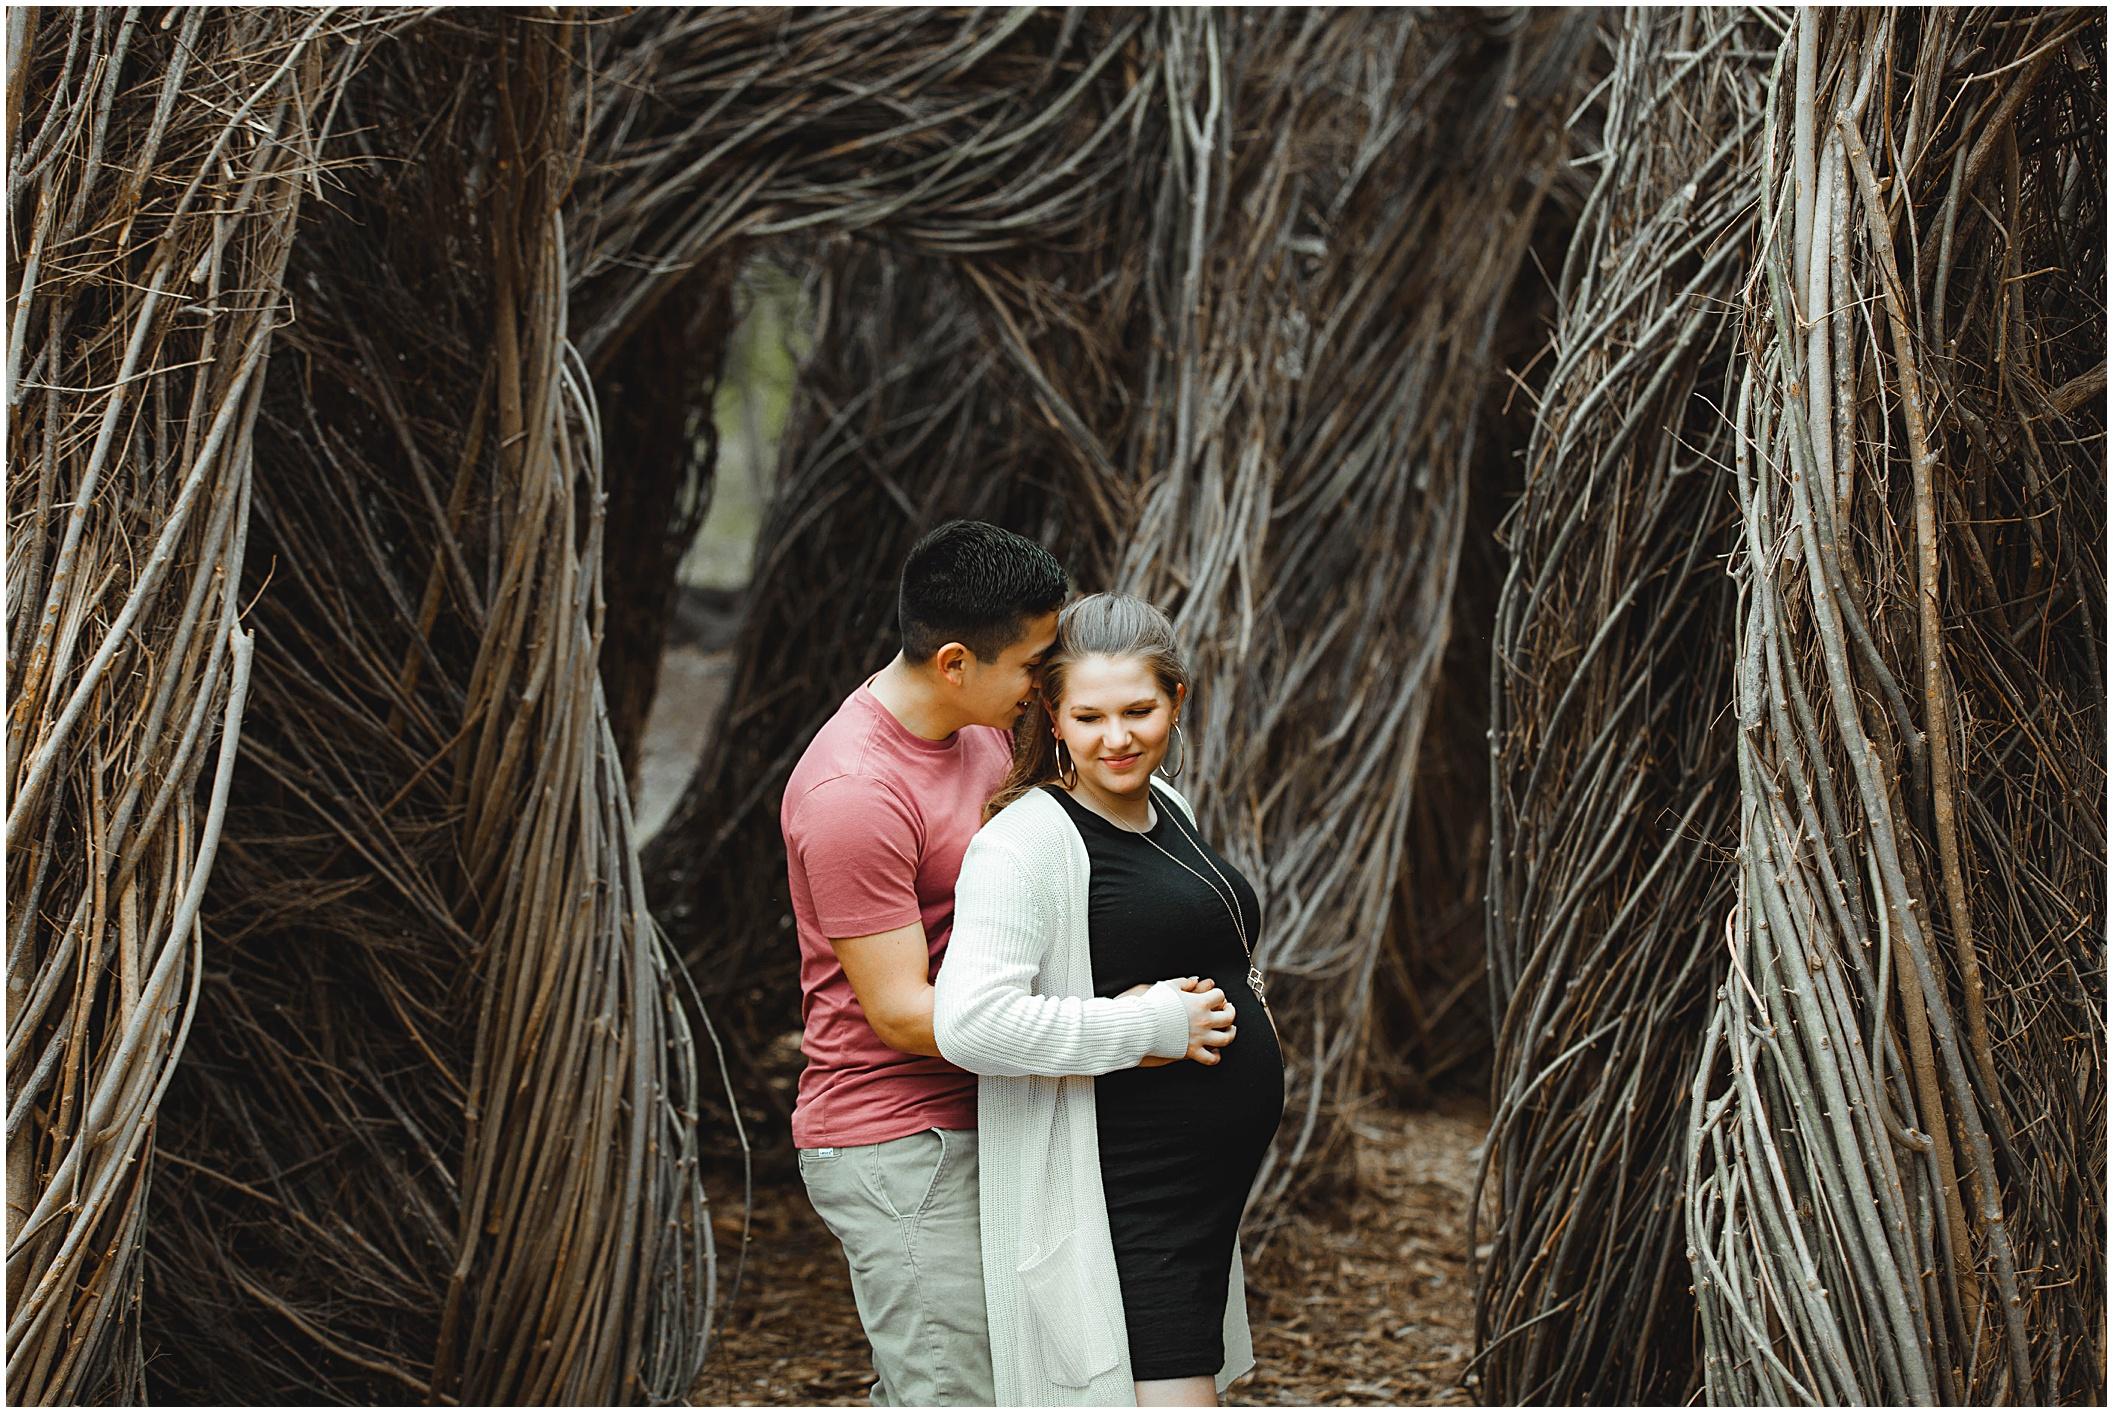 couples-maternity-session-hugging-austin_0005.jpg